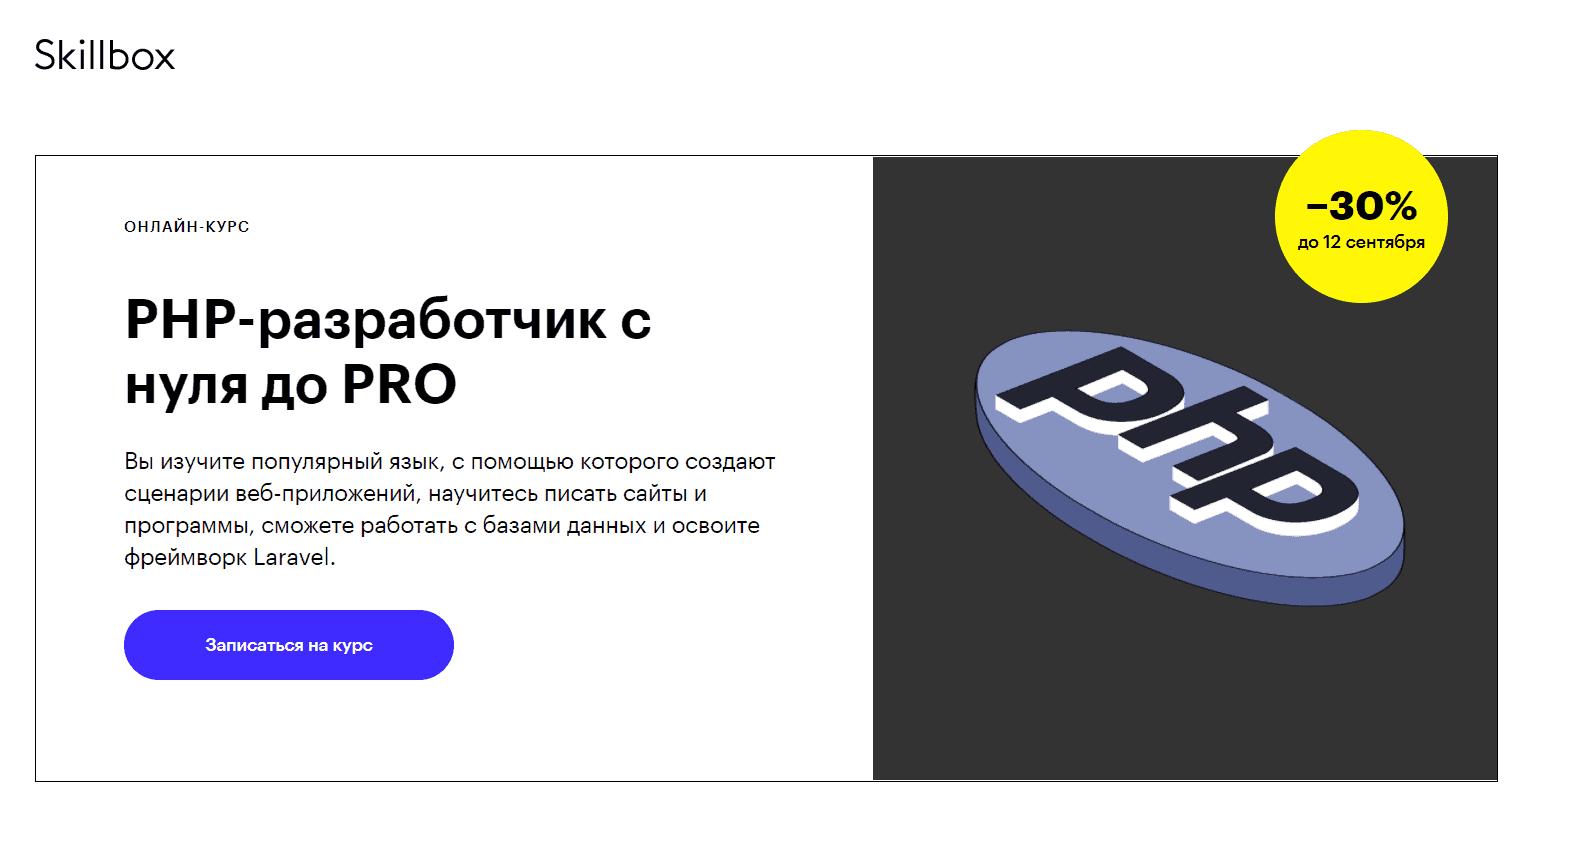 PHP-разработчик с нуля до PRO